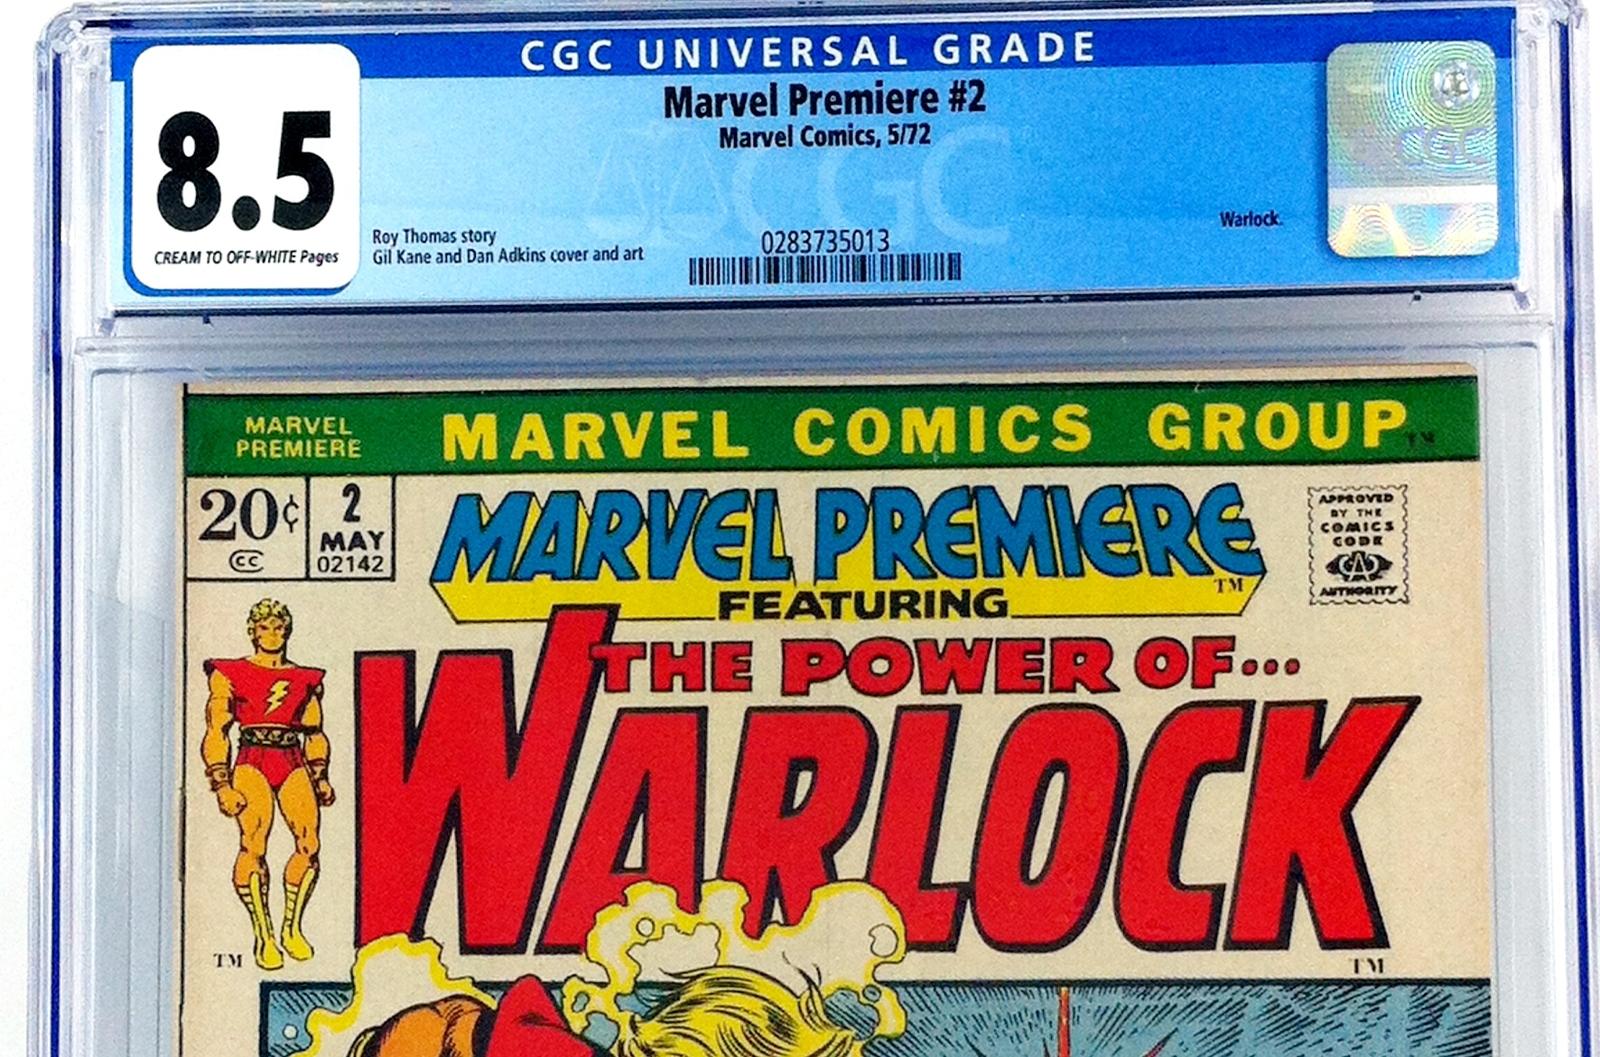 MARVEL PREMIERE #2 CGC 8.5 VF+ 1972 WARLOCK ROY THOMAS